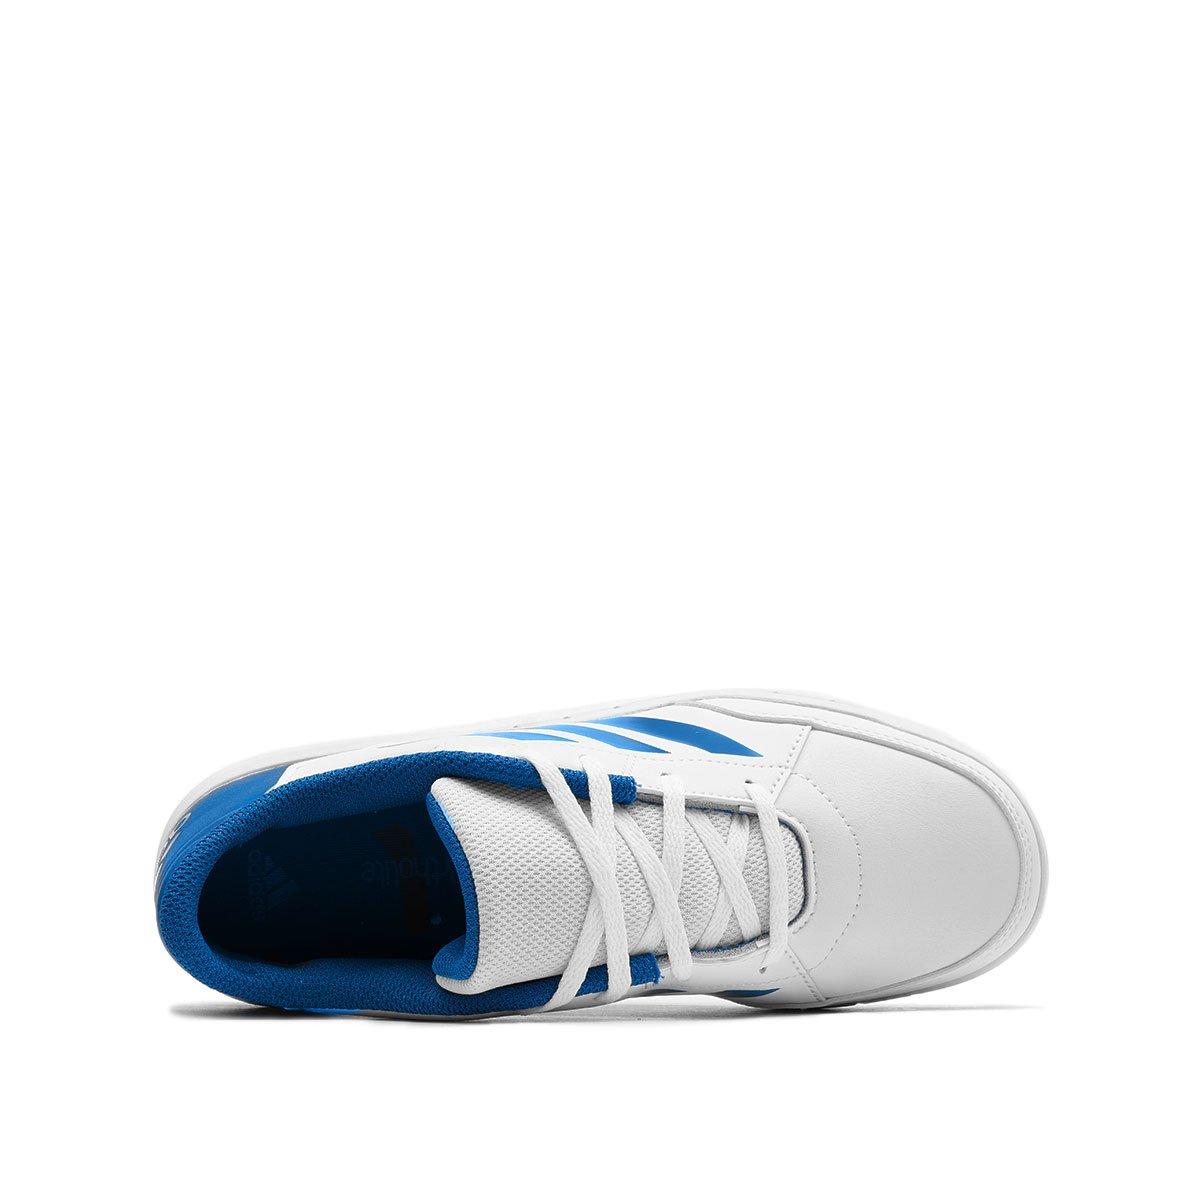 Adidas AltaSport